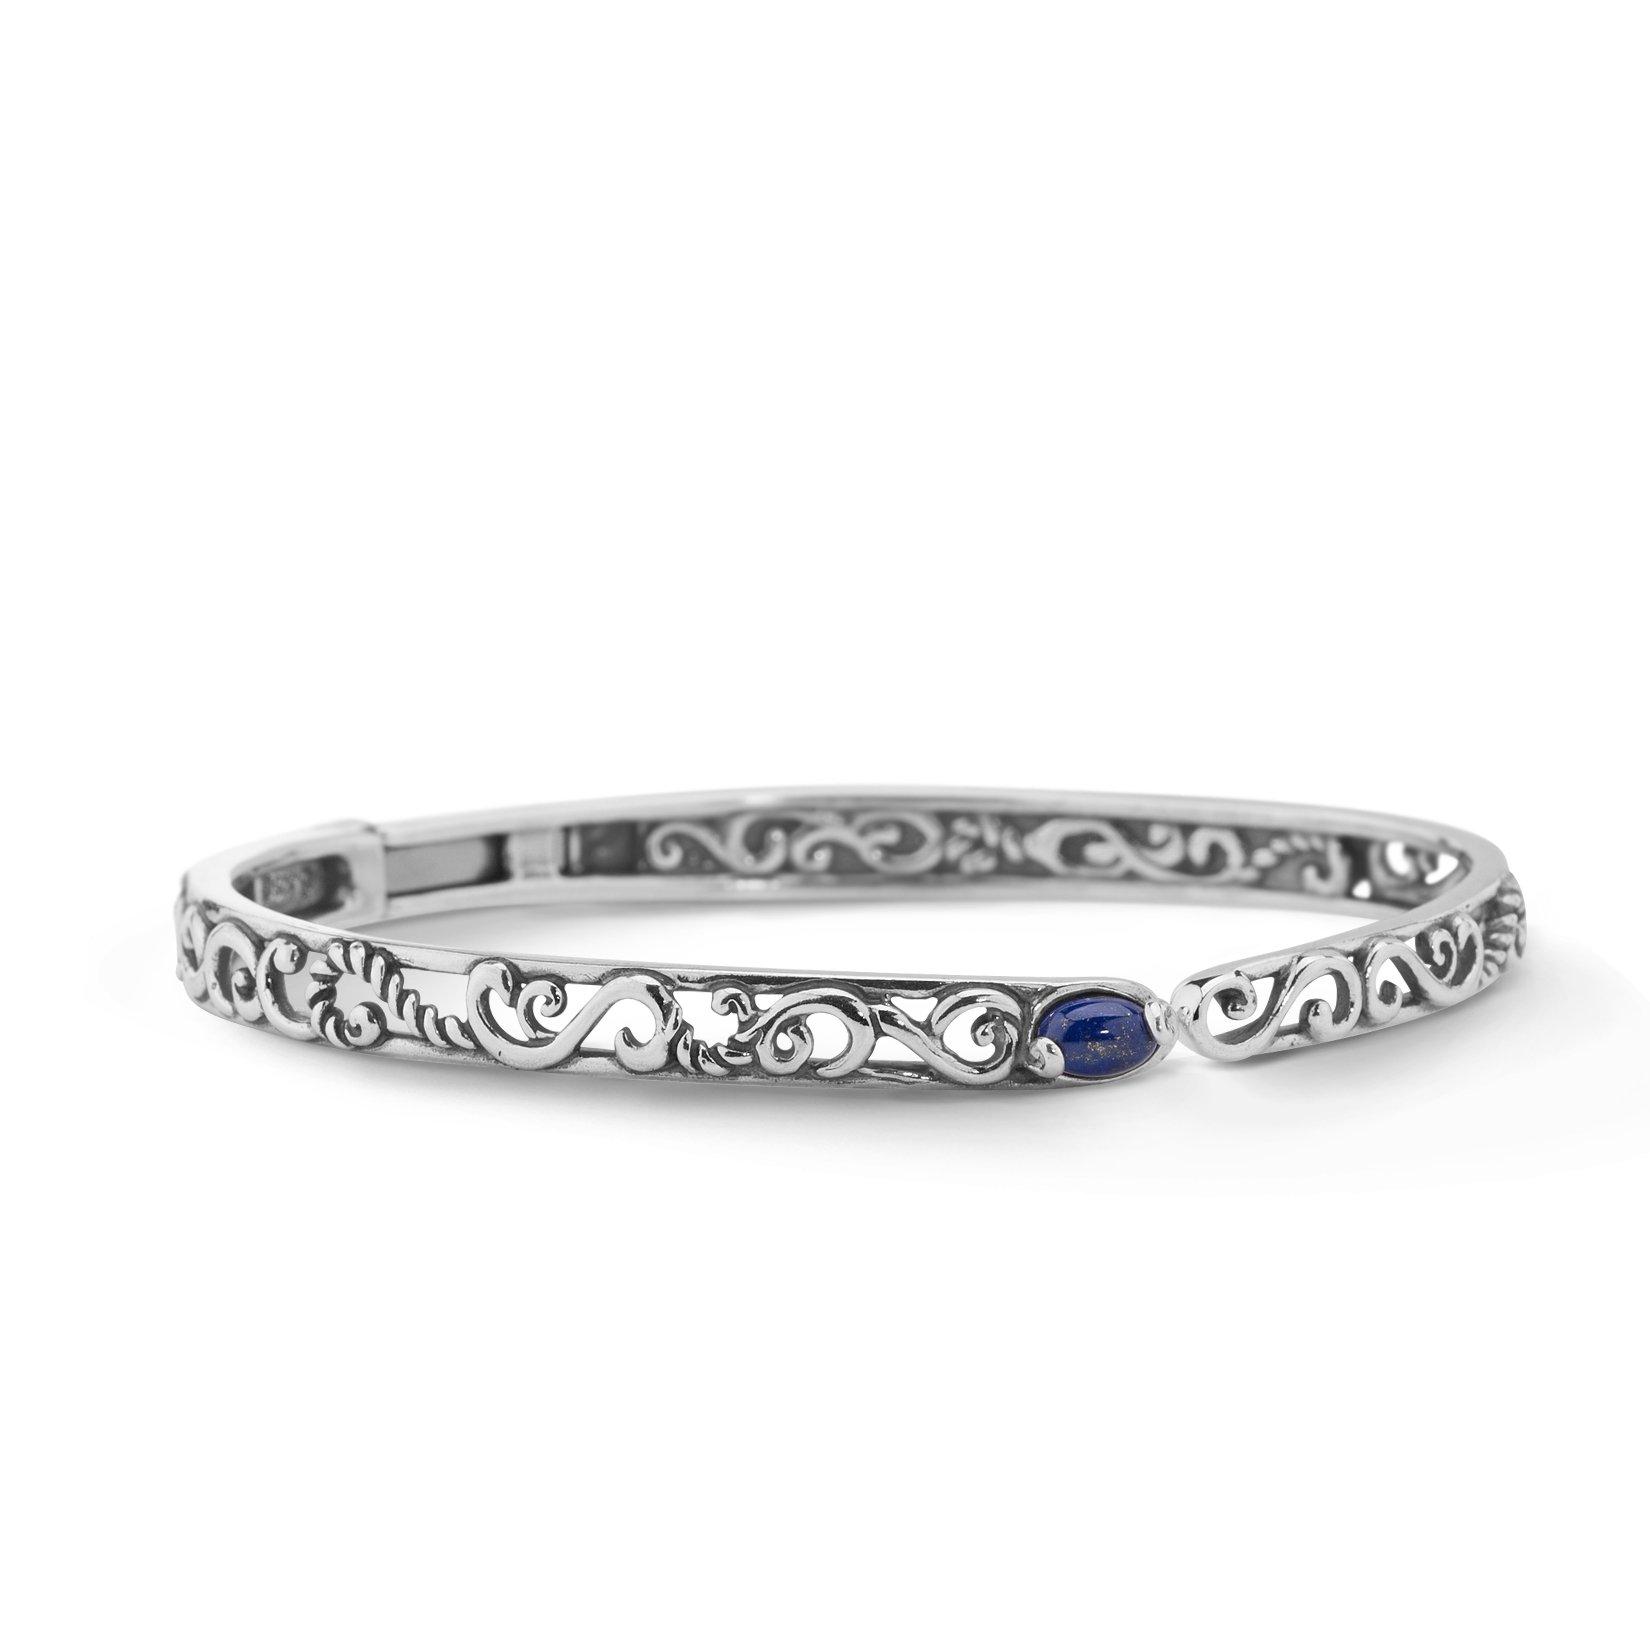 Carolyn Pollack Genuine .925 Sterling Silver Blue Lapis Hinged Cuff Bracelet by Carolyn Pollack